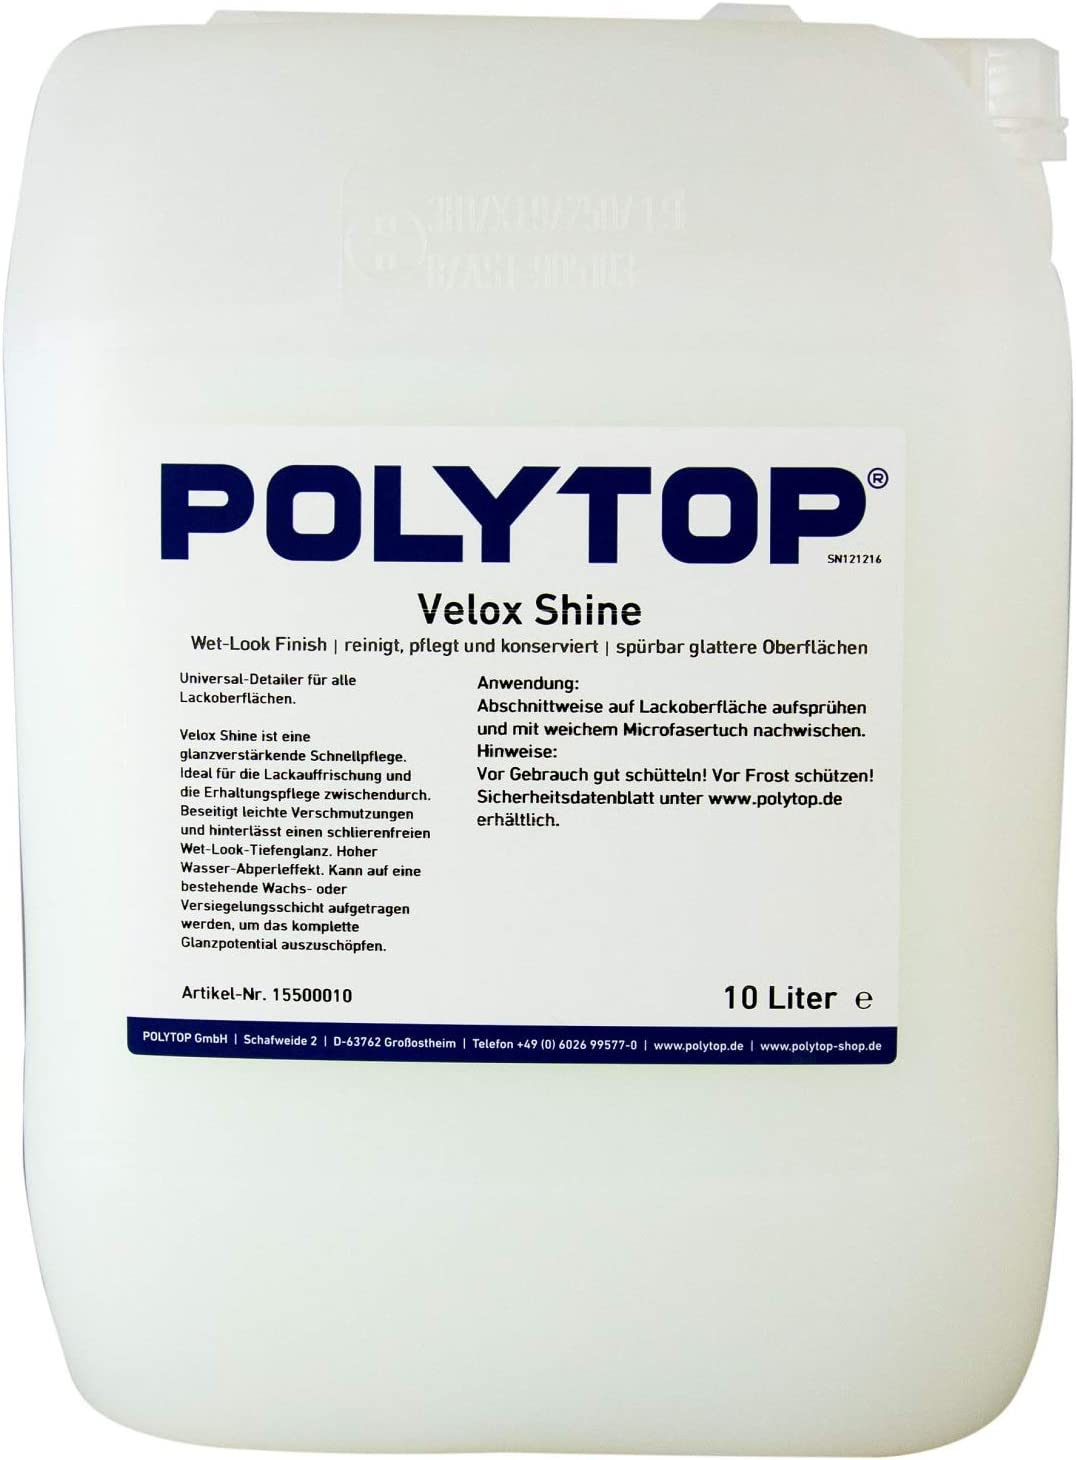 Polytop Velox Shine Universal Detailer Detailer Lackreiniger Lackpflege 10 Liter Auto